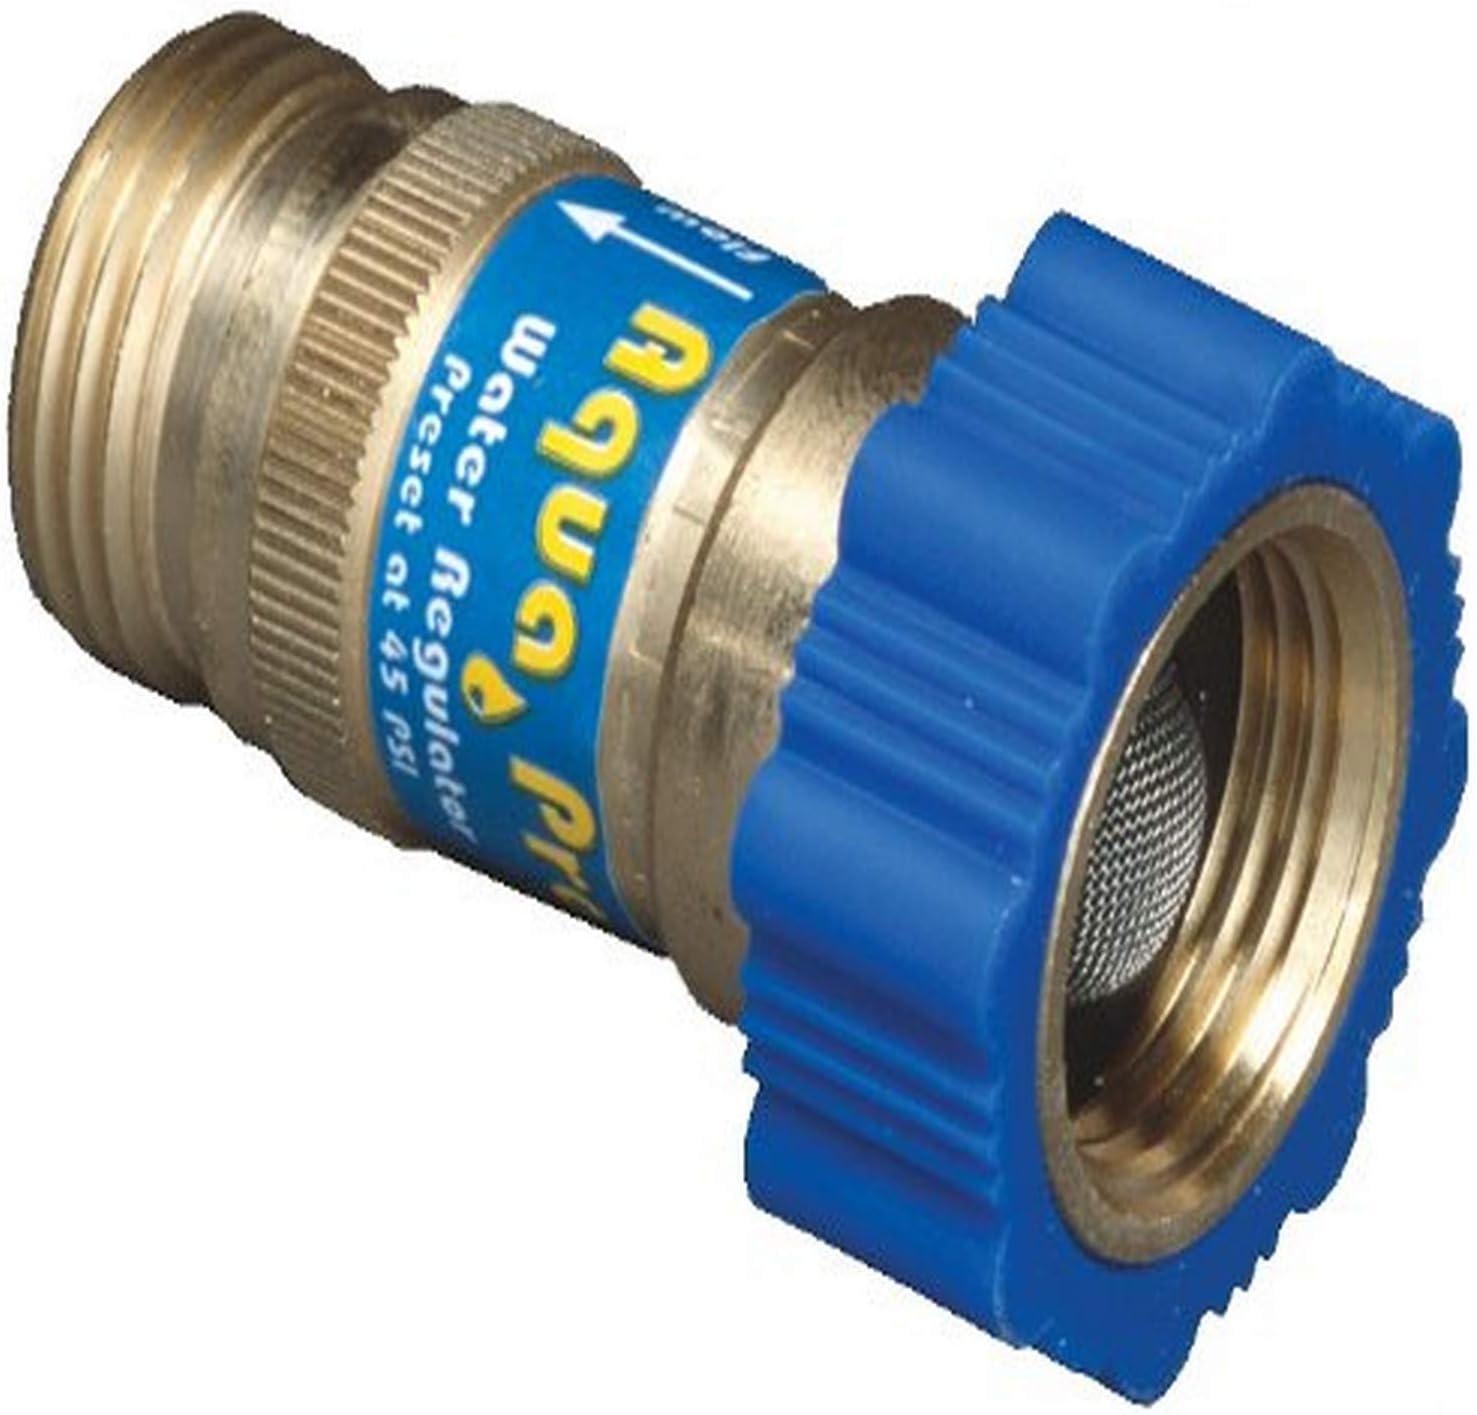 Aqua Pro 20847 Standard Regulator